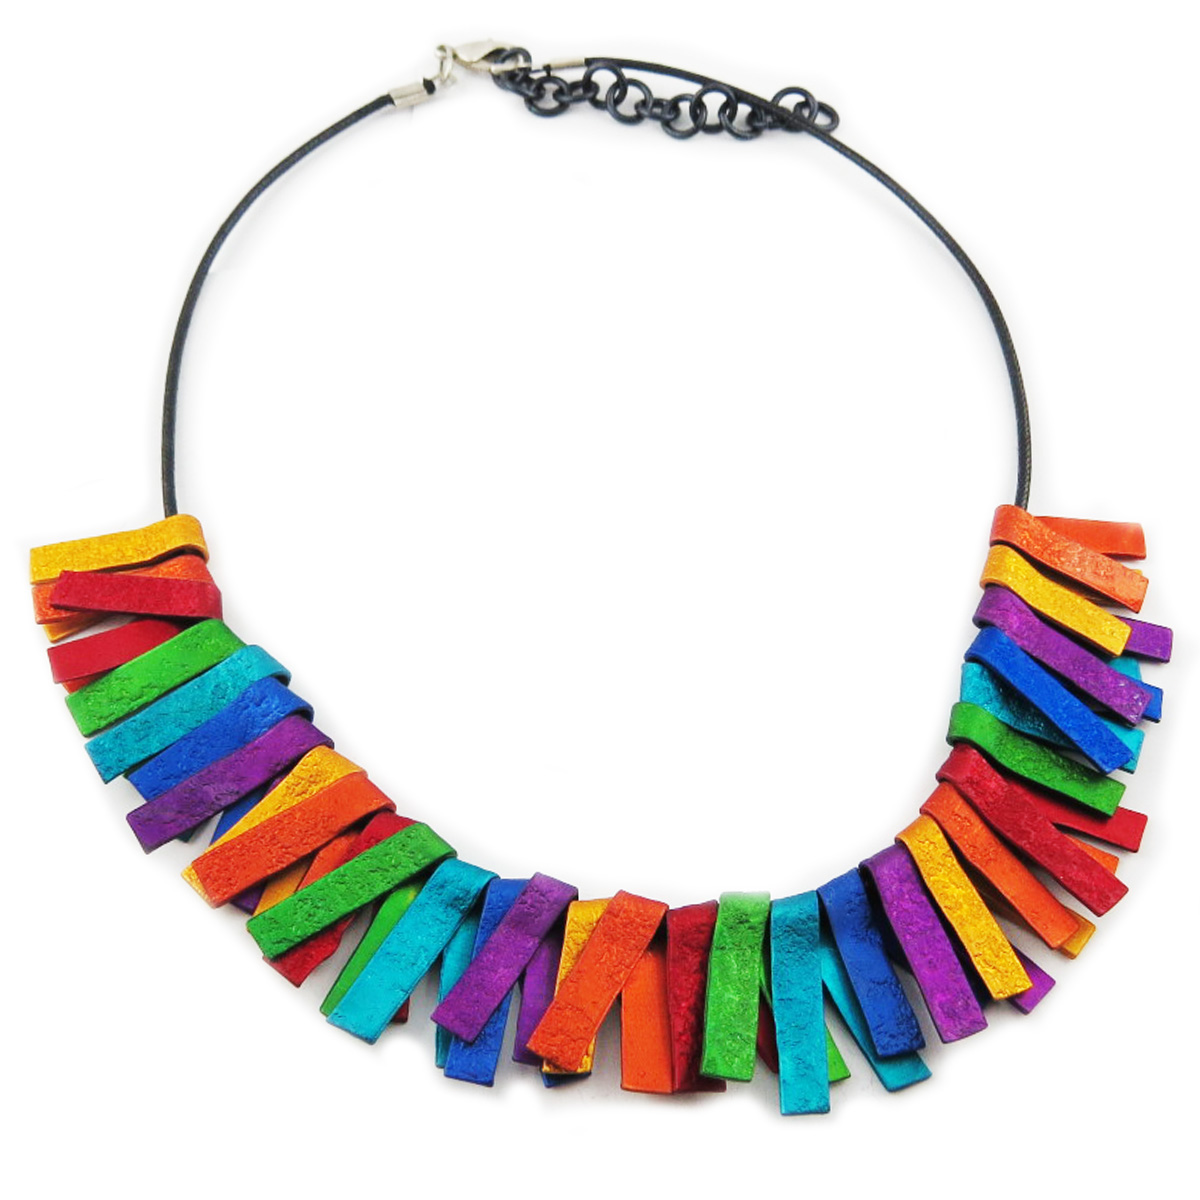 Collier artisanal \'Aluminirock\' multicolore - largeur 2 cm - [R1218]